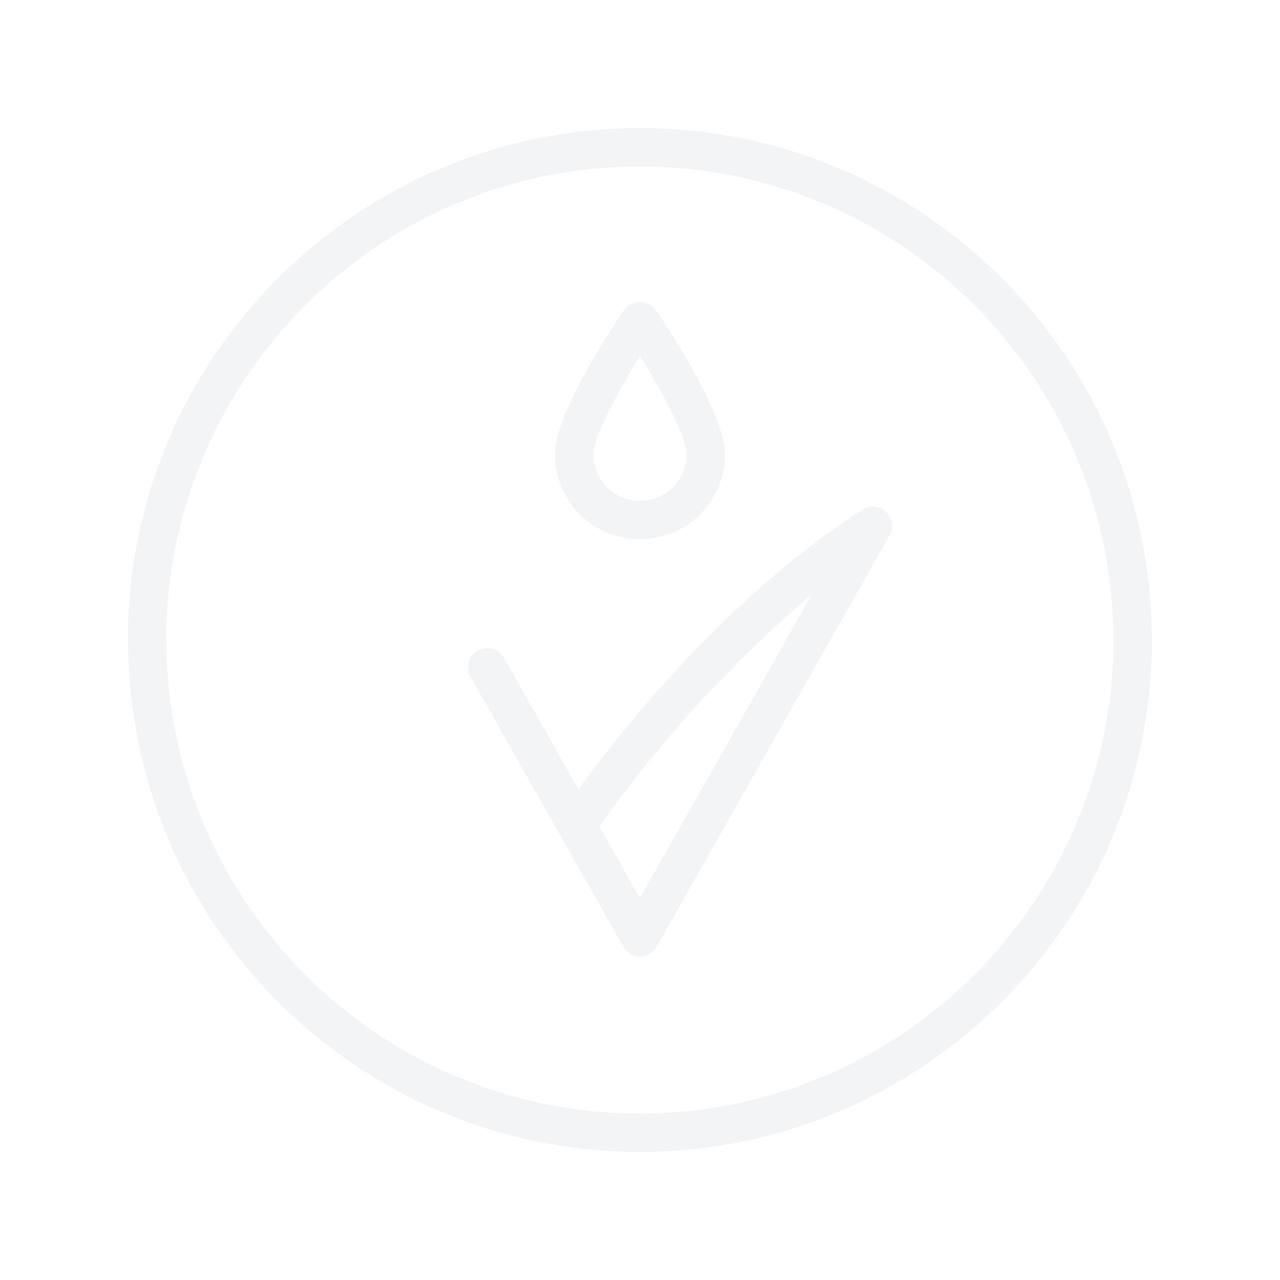 Dr. Hauschka Regenerating Day Cream 40ml